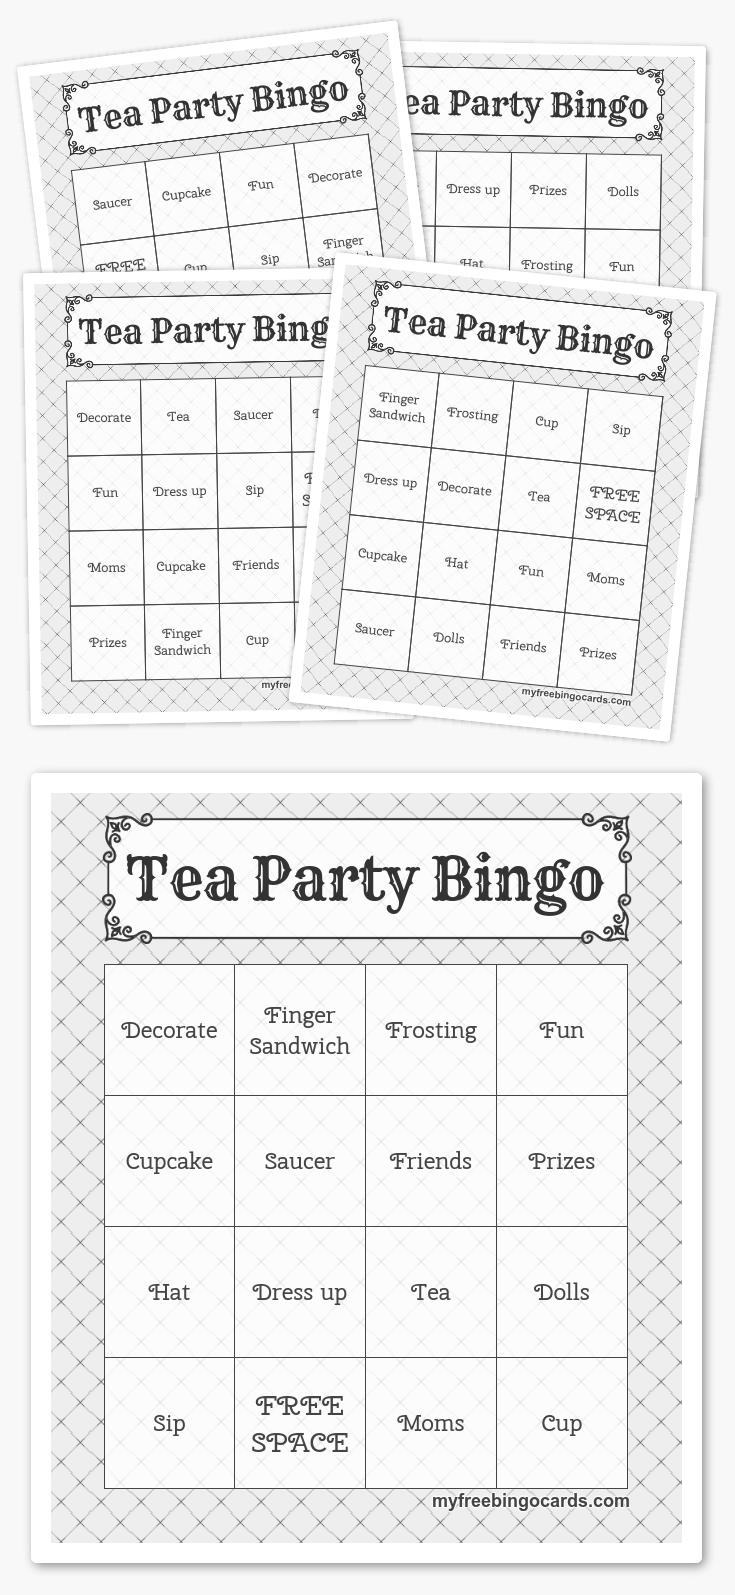 Free Printable Bingo Cards In 2019 | Printables | Pinterest | Harry - Free Printable Tea Party Games